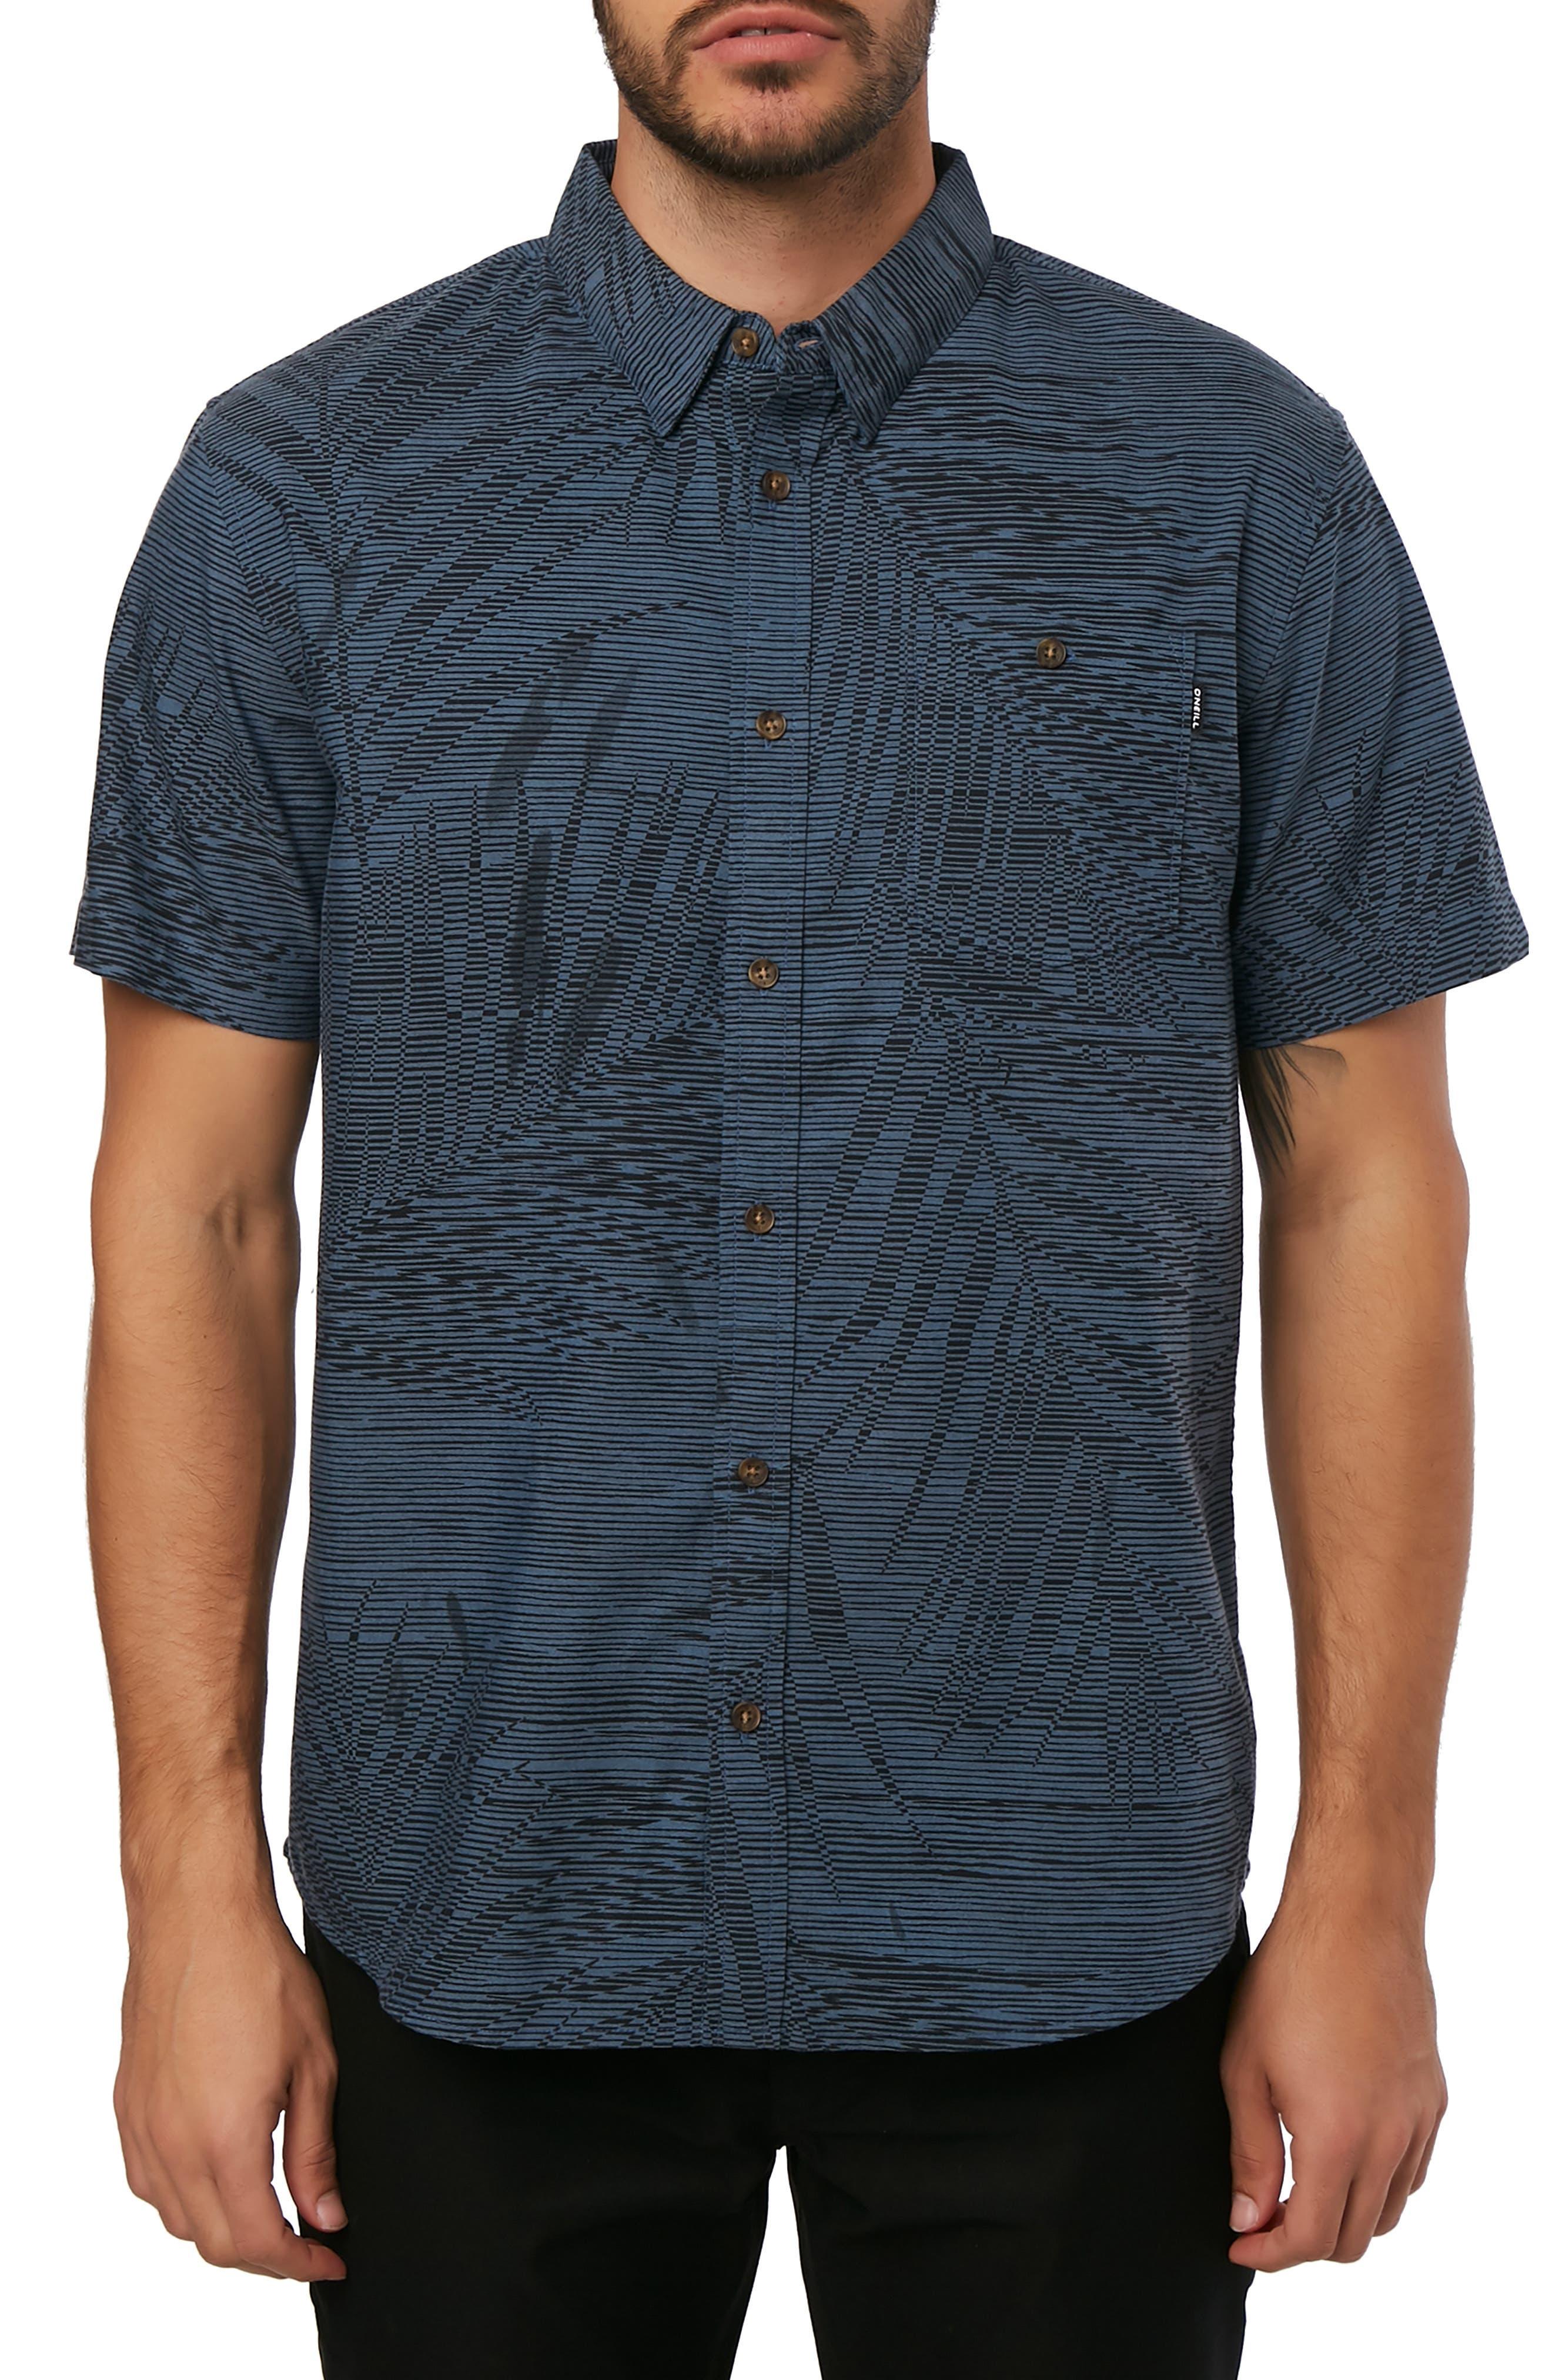 Fronzarelli Woven Shirt,                             Main thumbnail 1, color,                             DARK BLUE